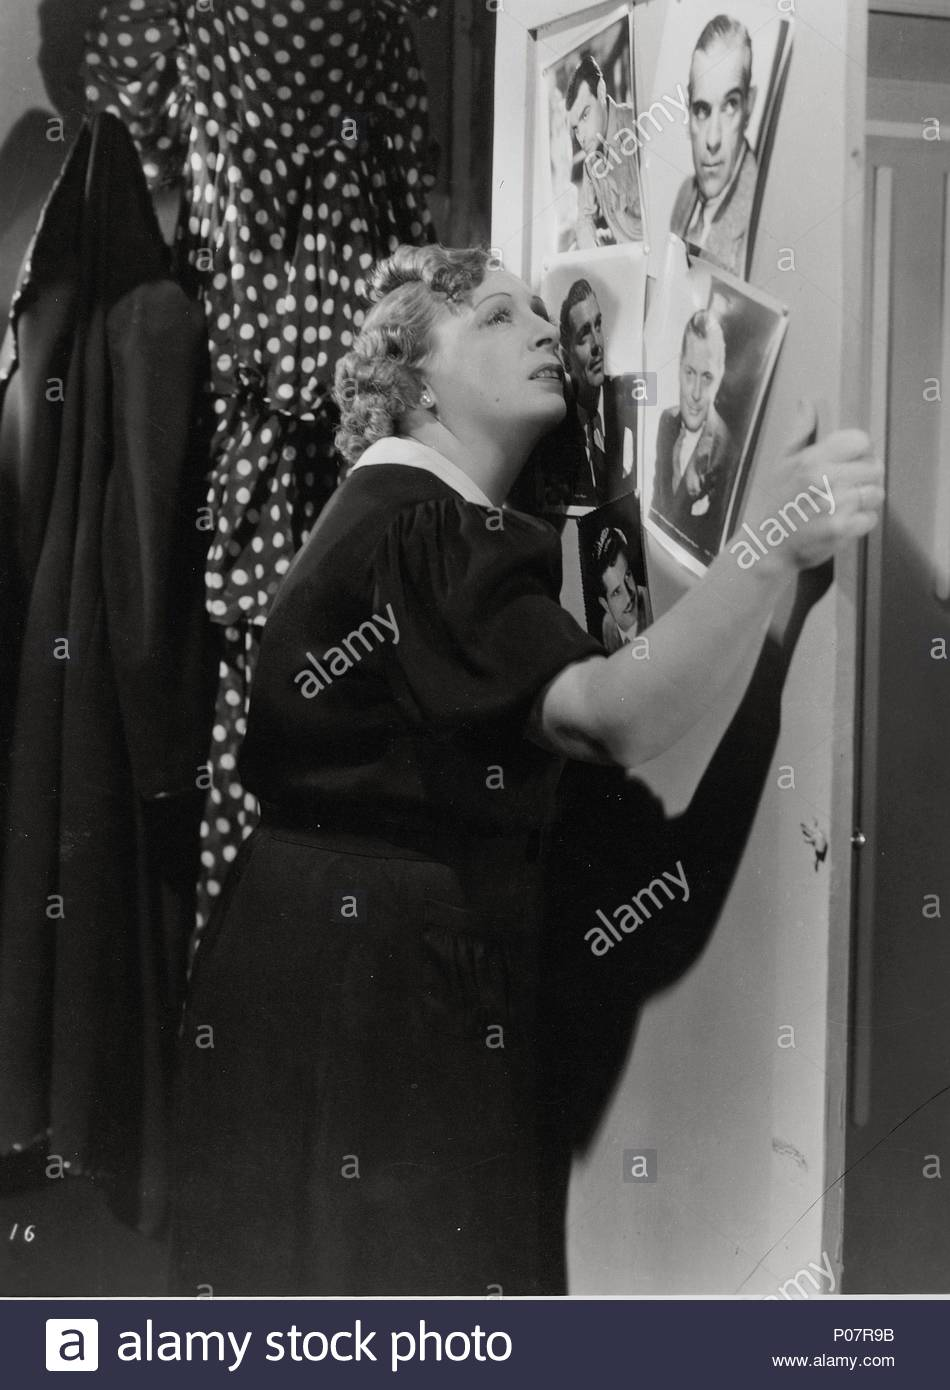 Original Film Title: LOS APUROS DE CLAUDINA.  English Title: LOS APUROS DE CLAUDINA.  Film Director: MIGUEL CORONATTO-PAZ.  Year: 1938.  Stars: OLINDA BOZAN. - Stock Image